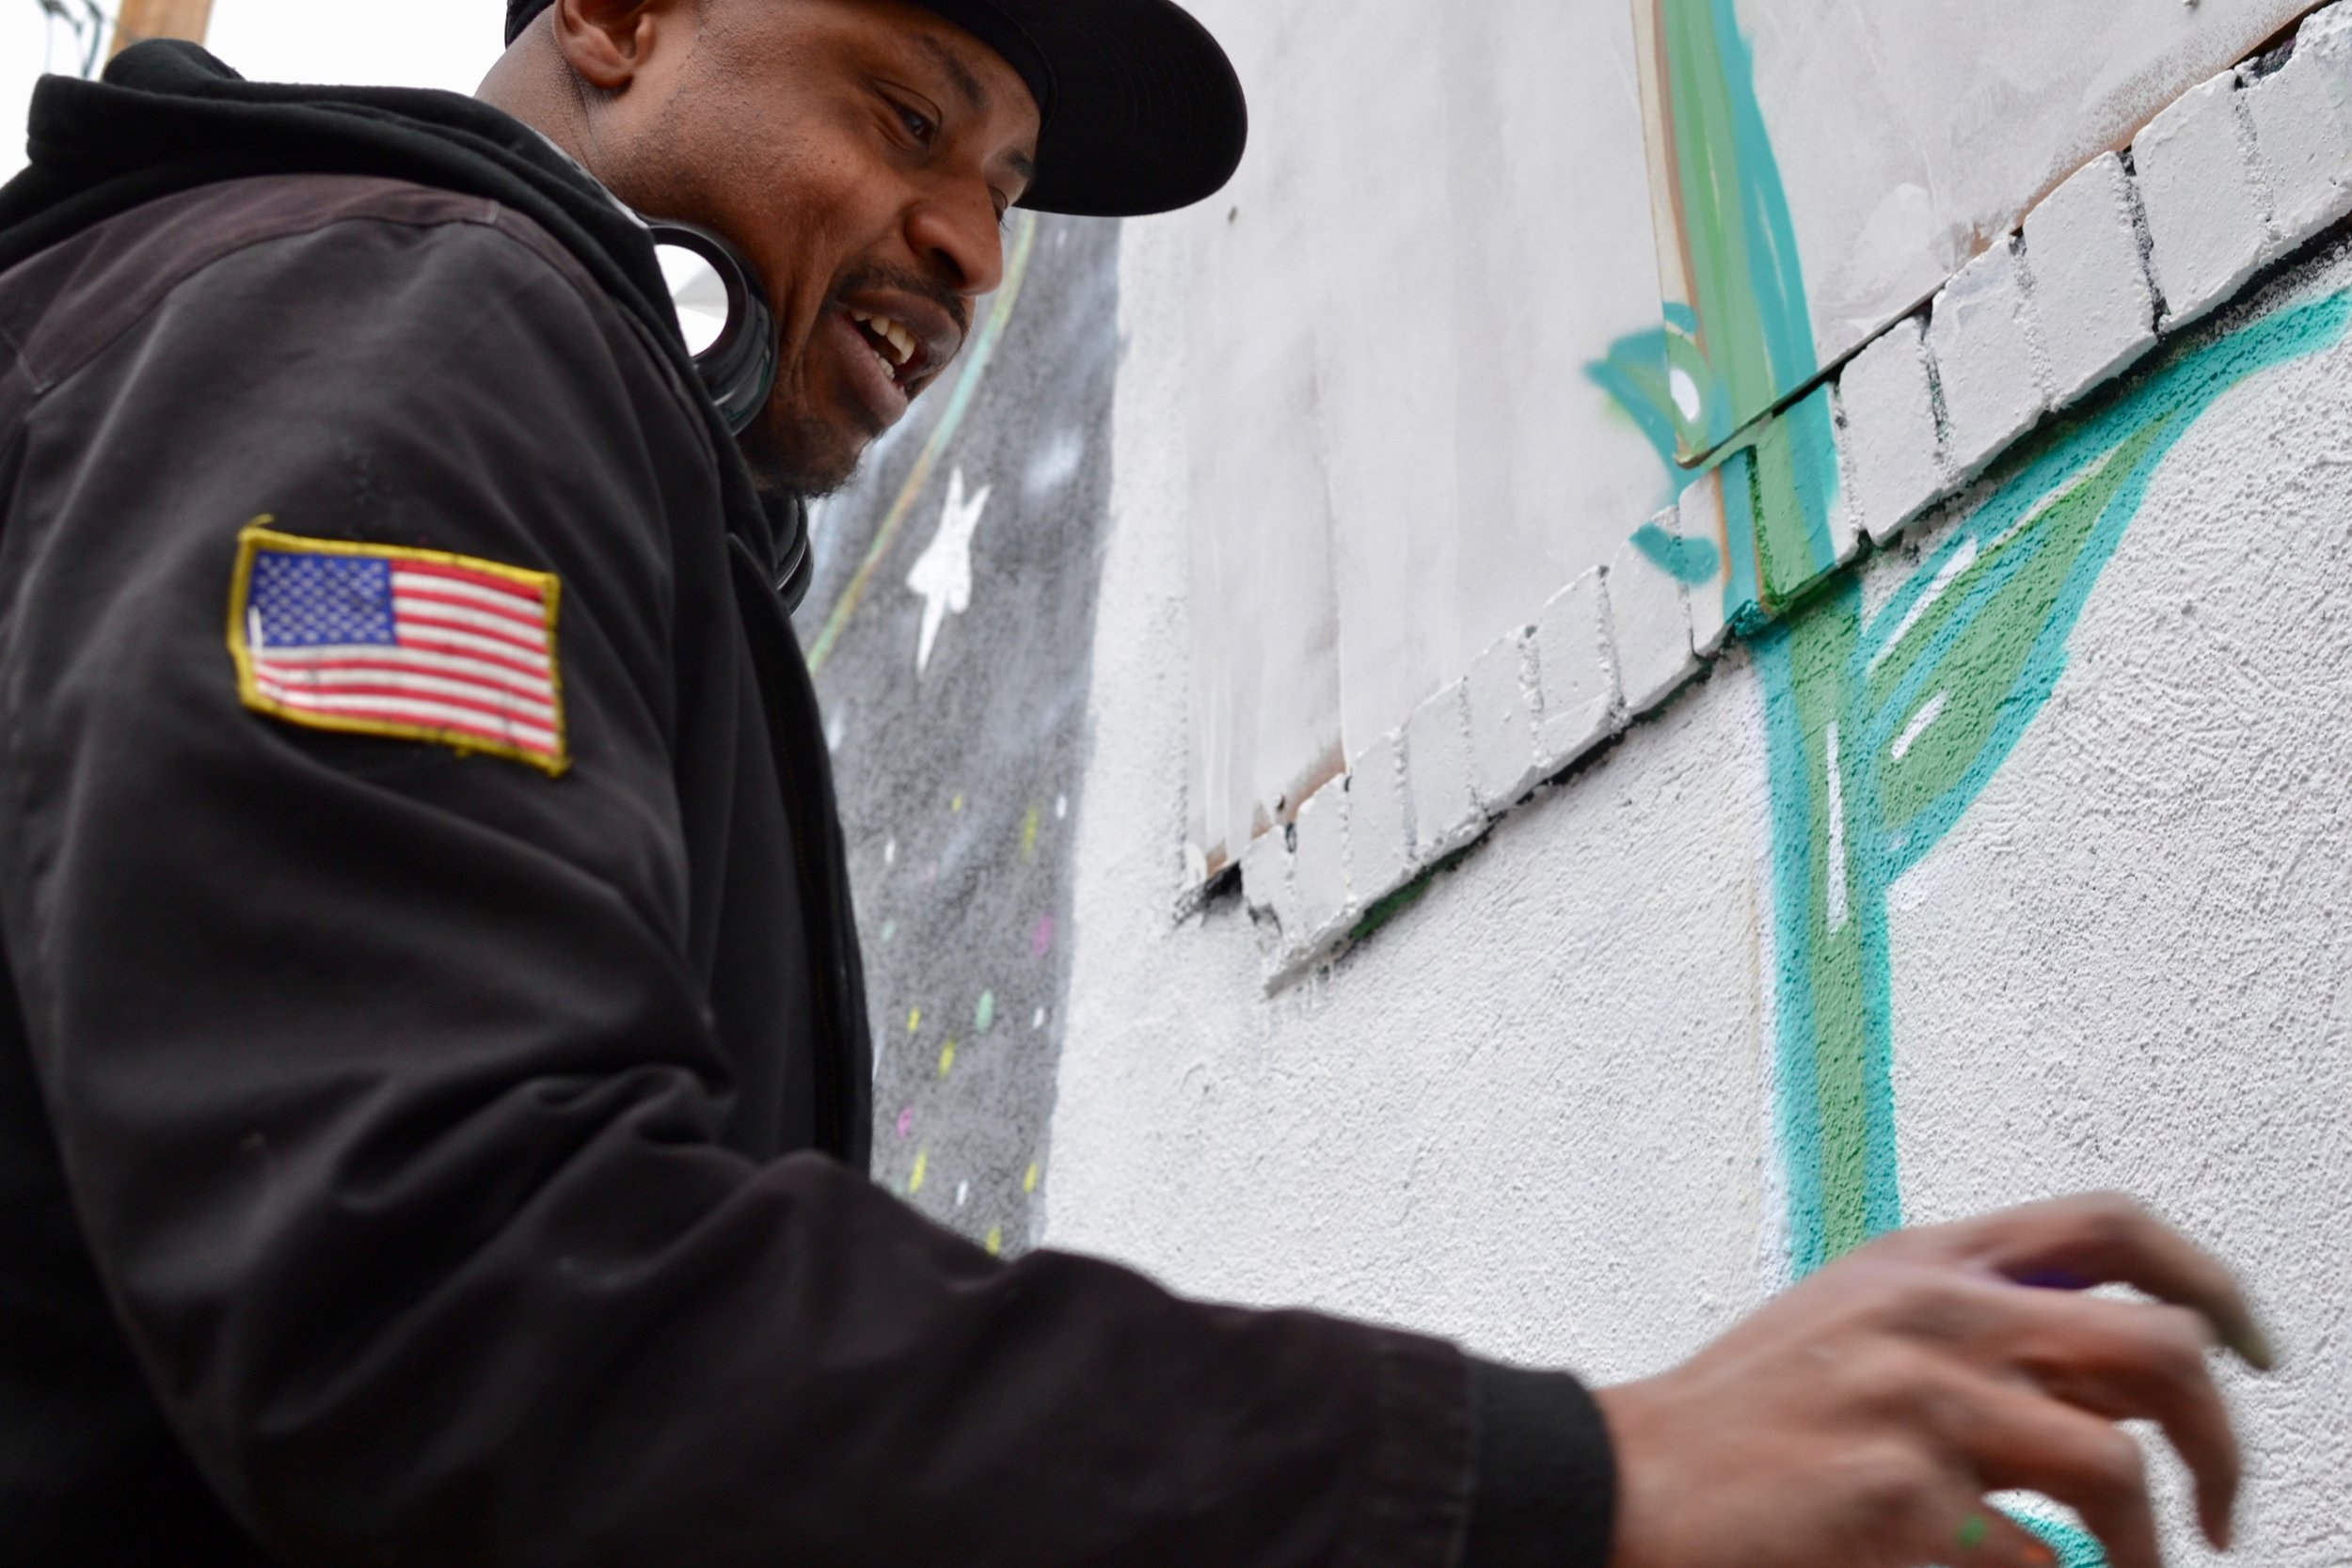 Robert Wright for Stain'd Arts' interview with artist series, denver muralist6.jpeg